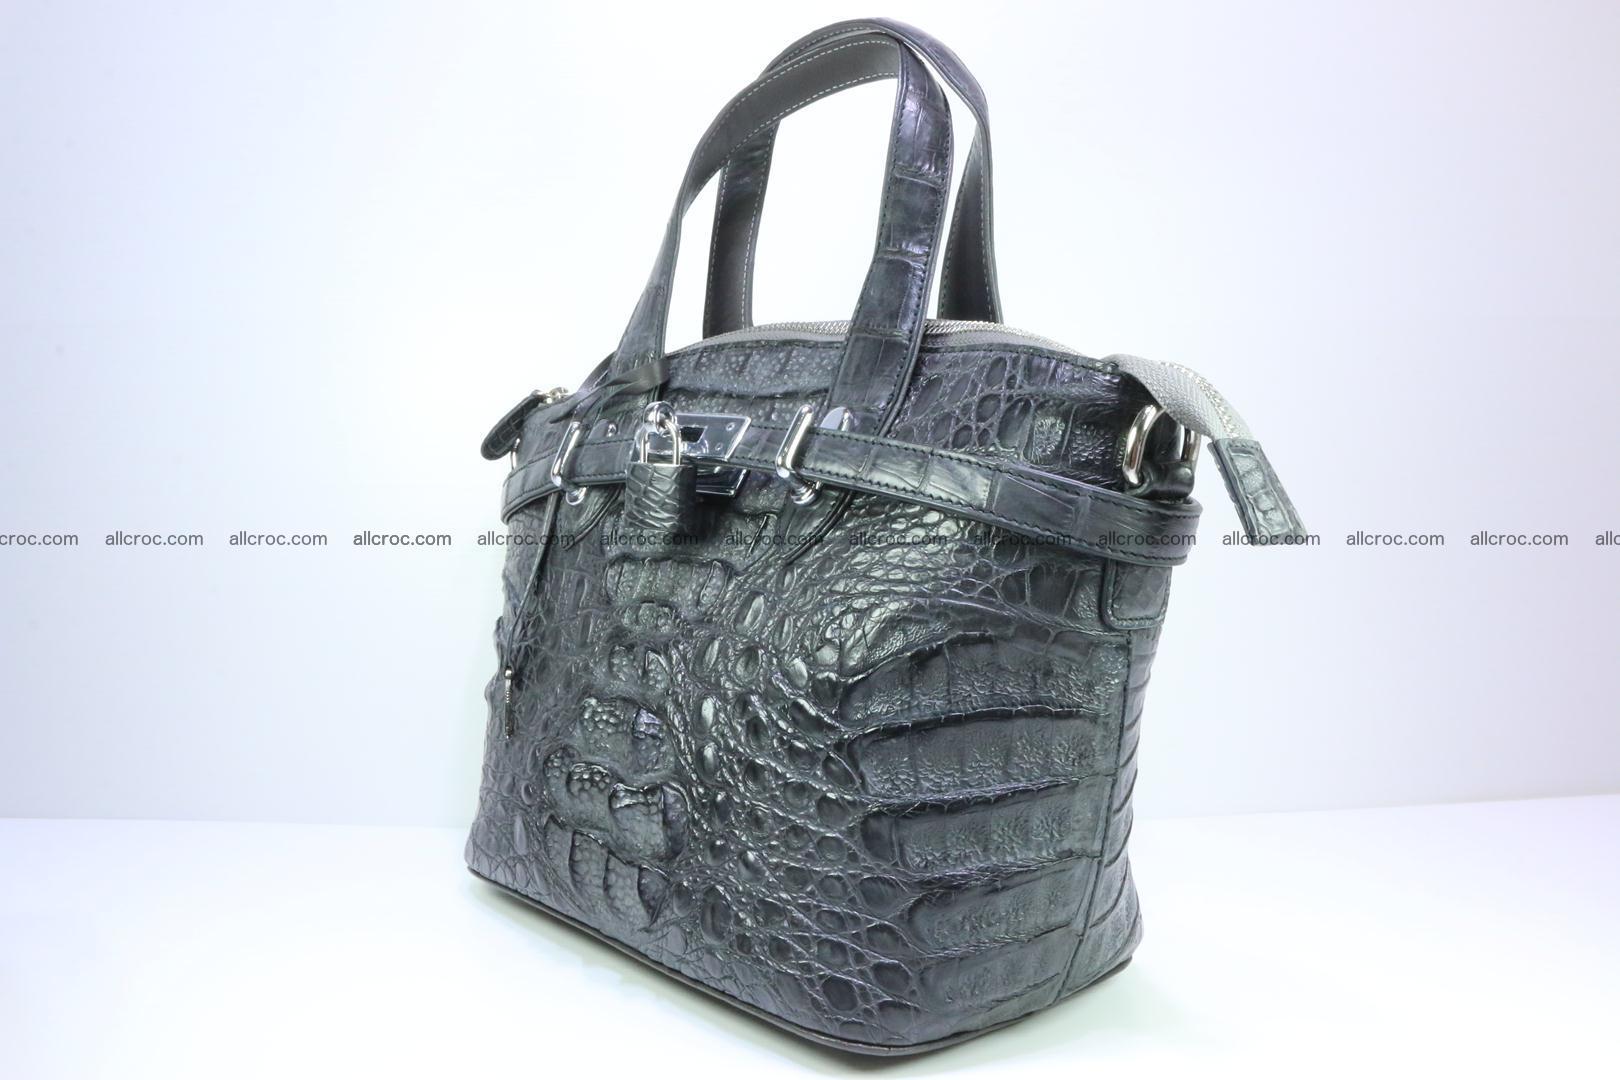 Genuine crocodile handbag for ladies 049 Foto 2